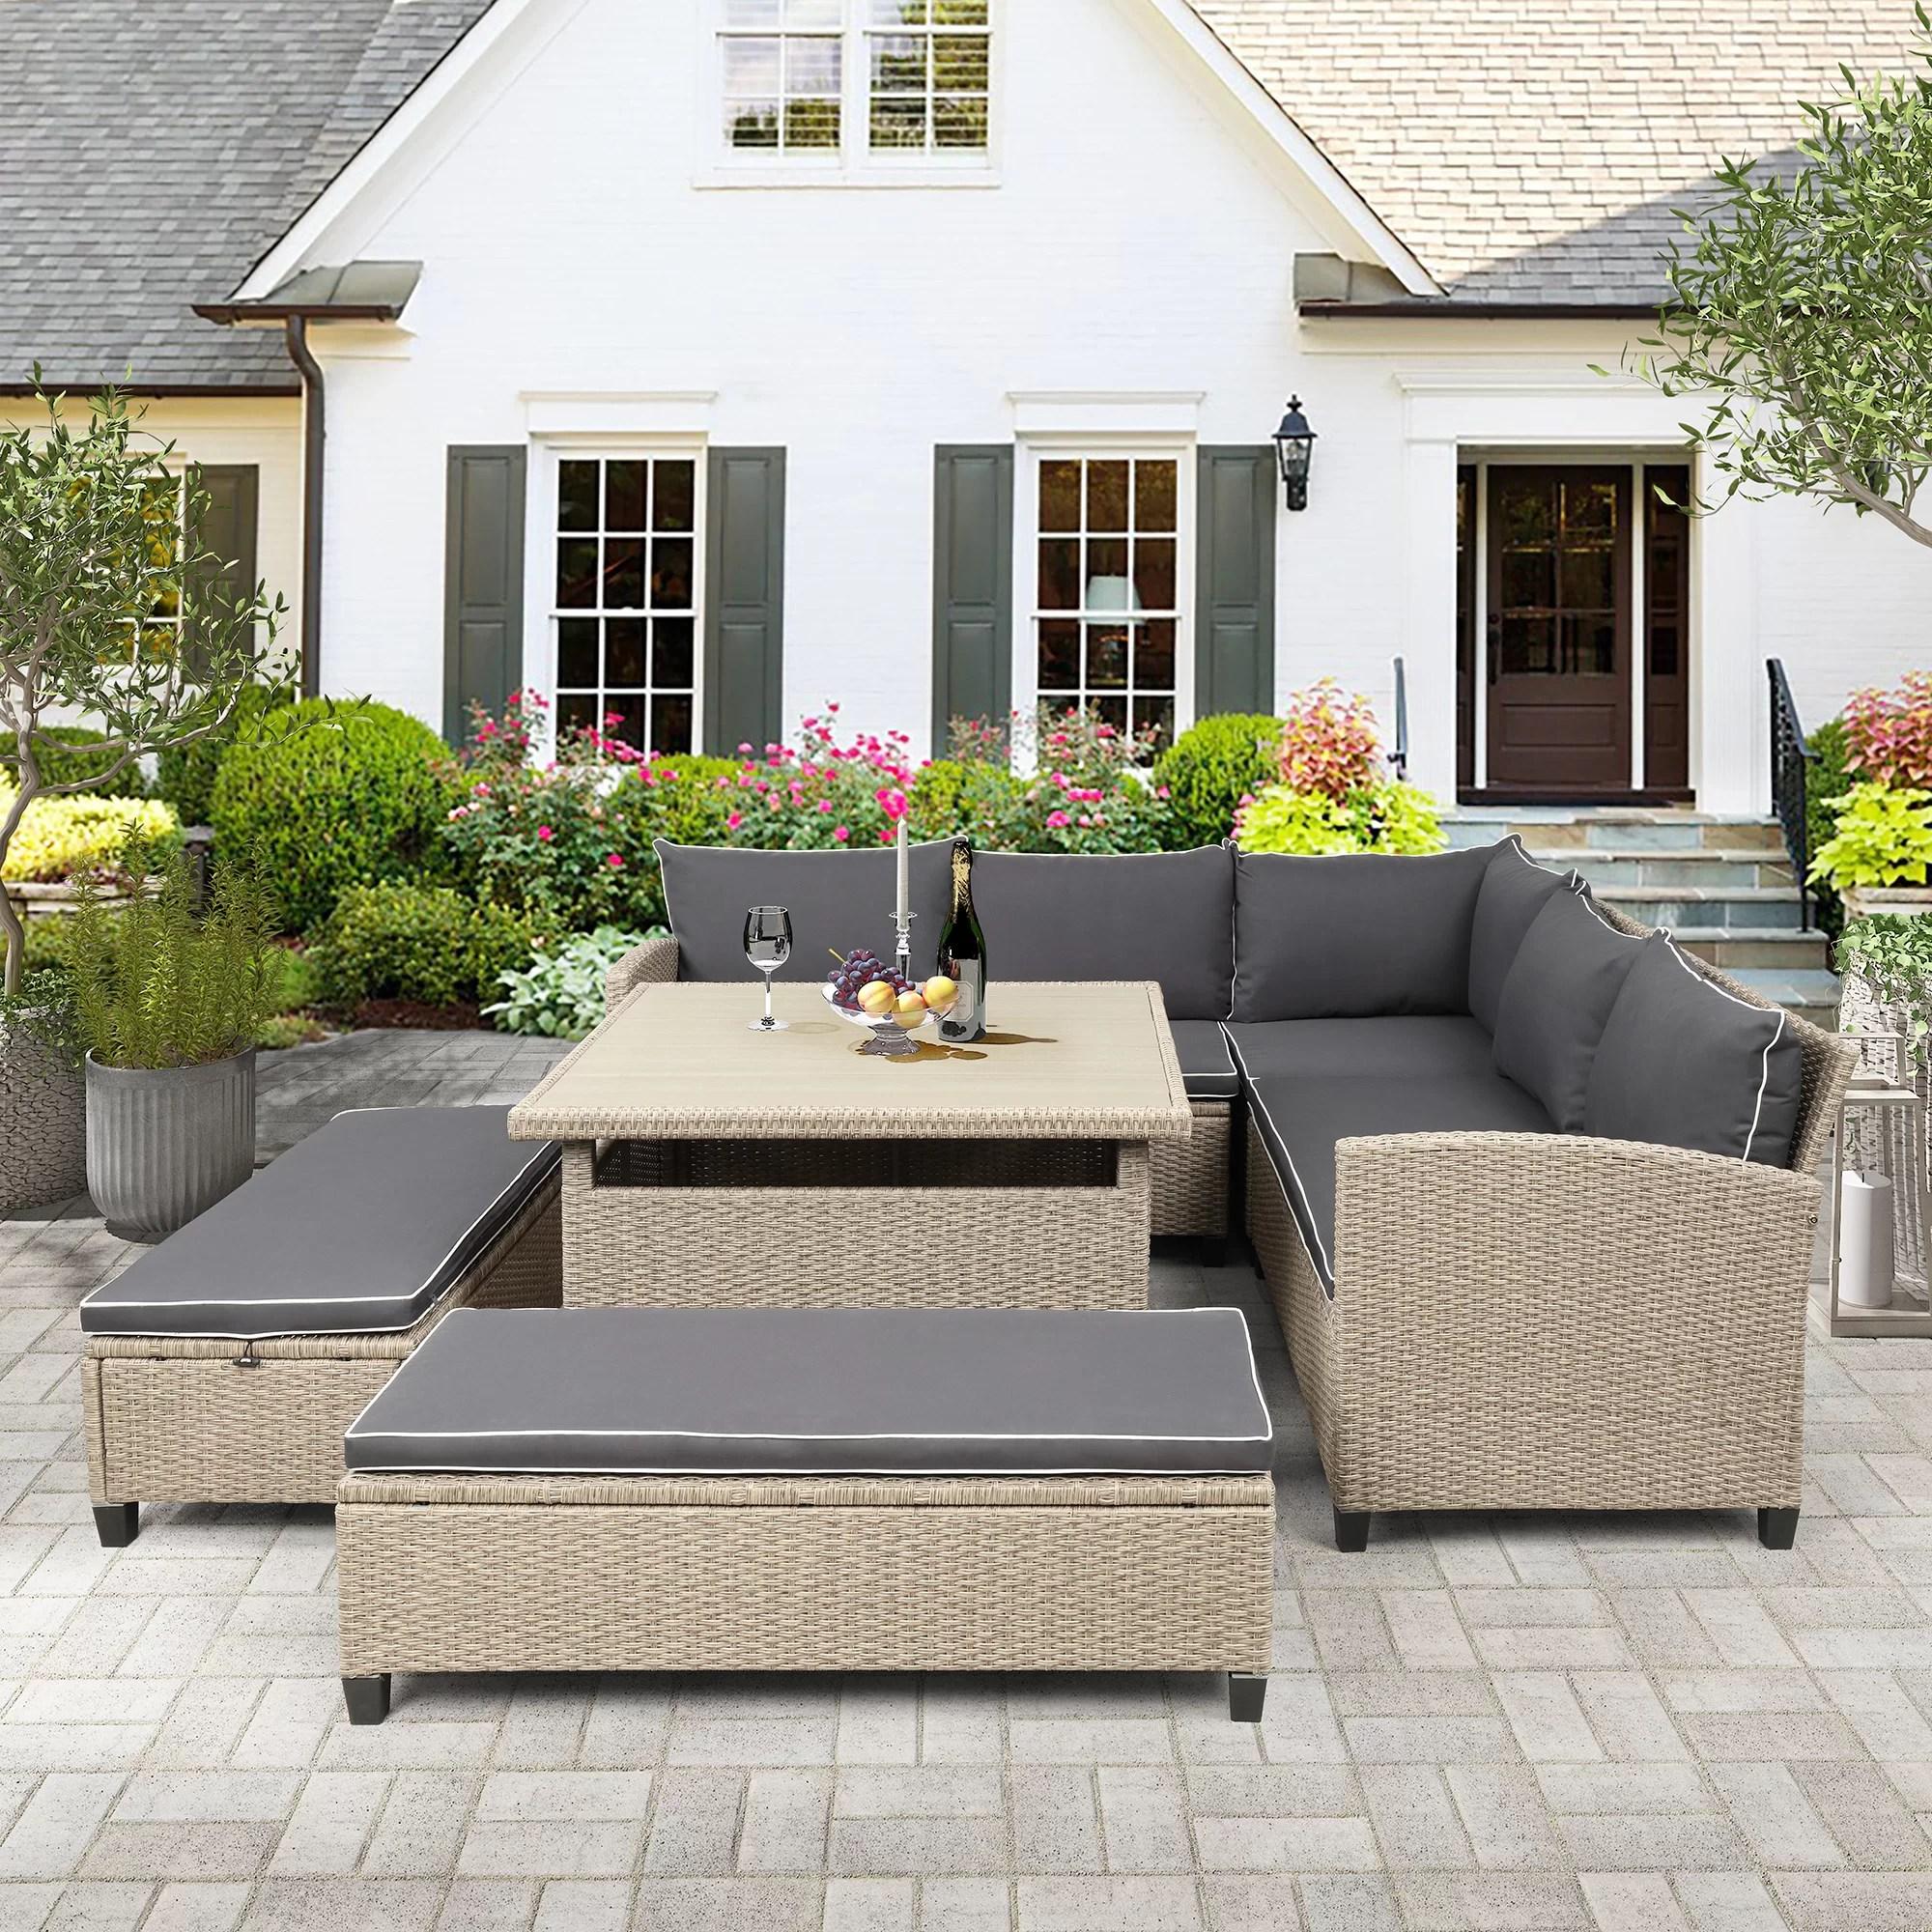 latitude run ahliana patio 6 piece rattan sofa seating group with cushions wayfair